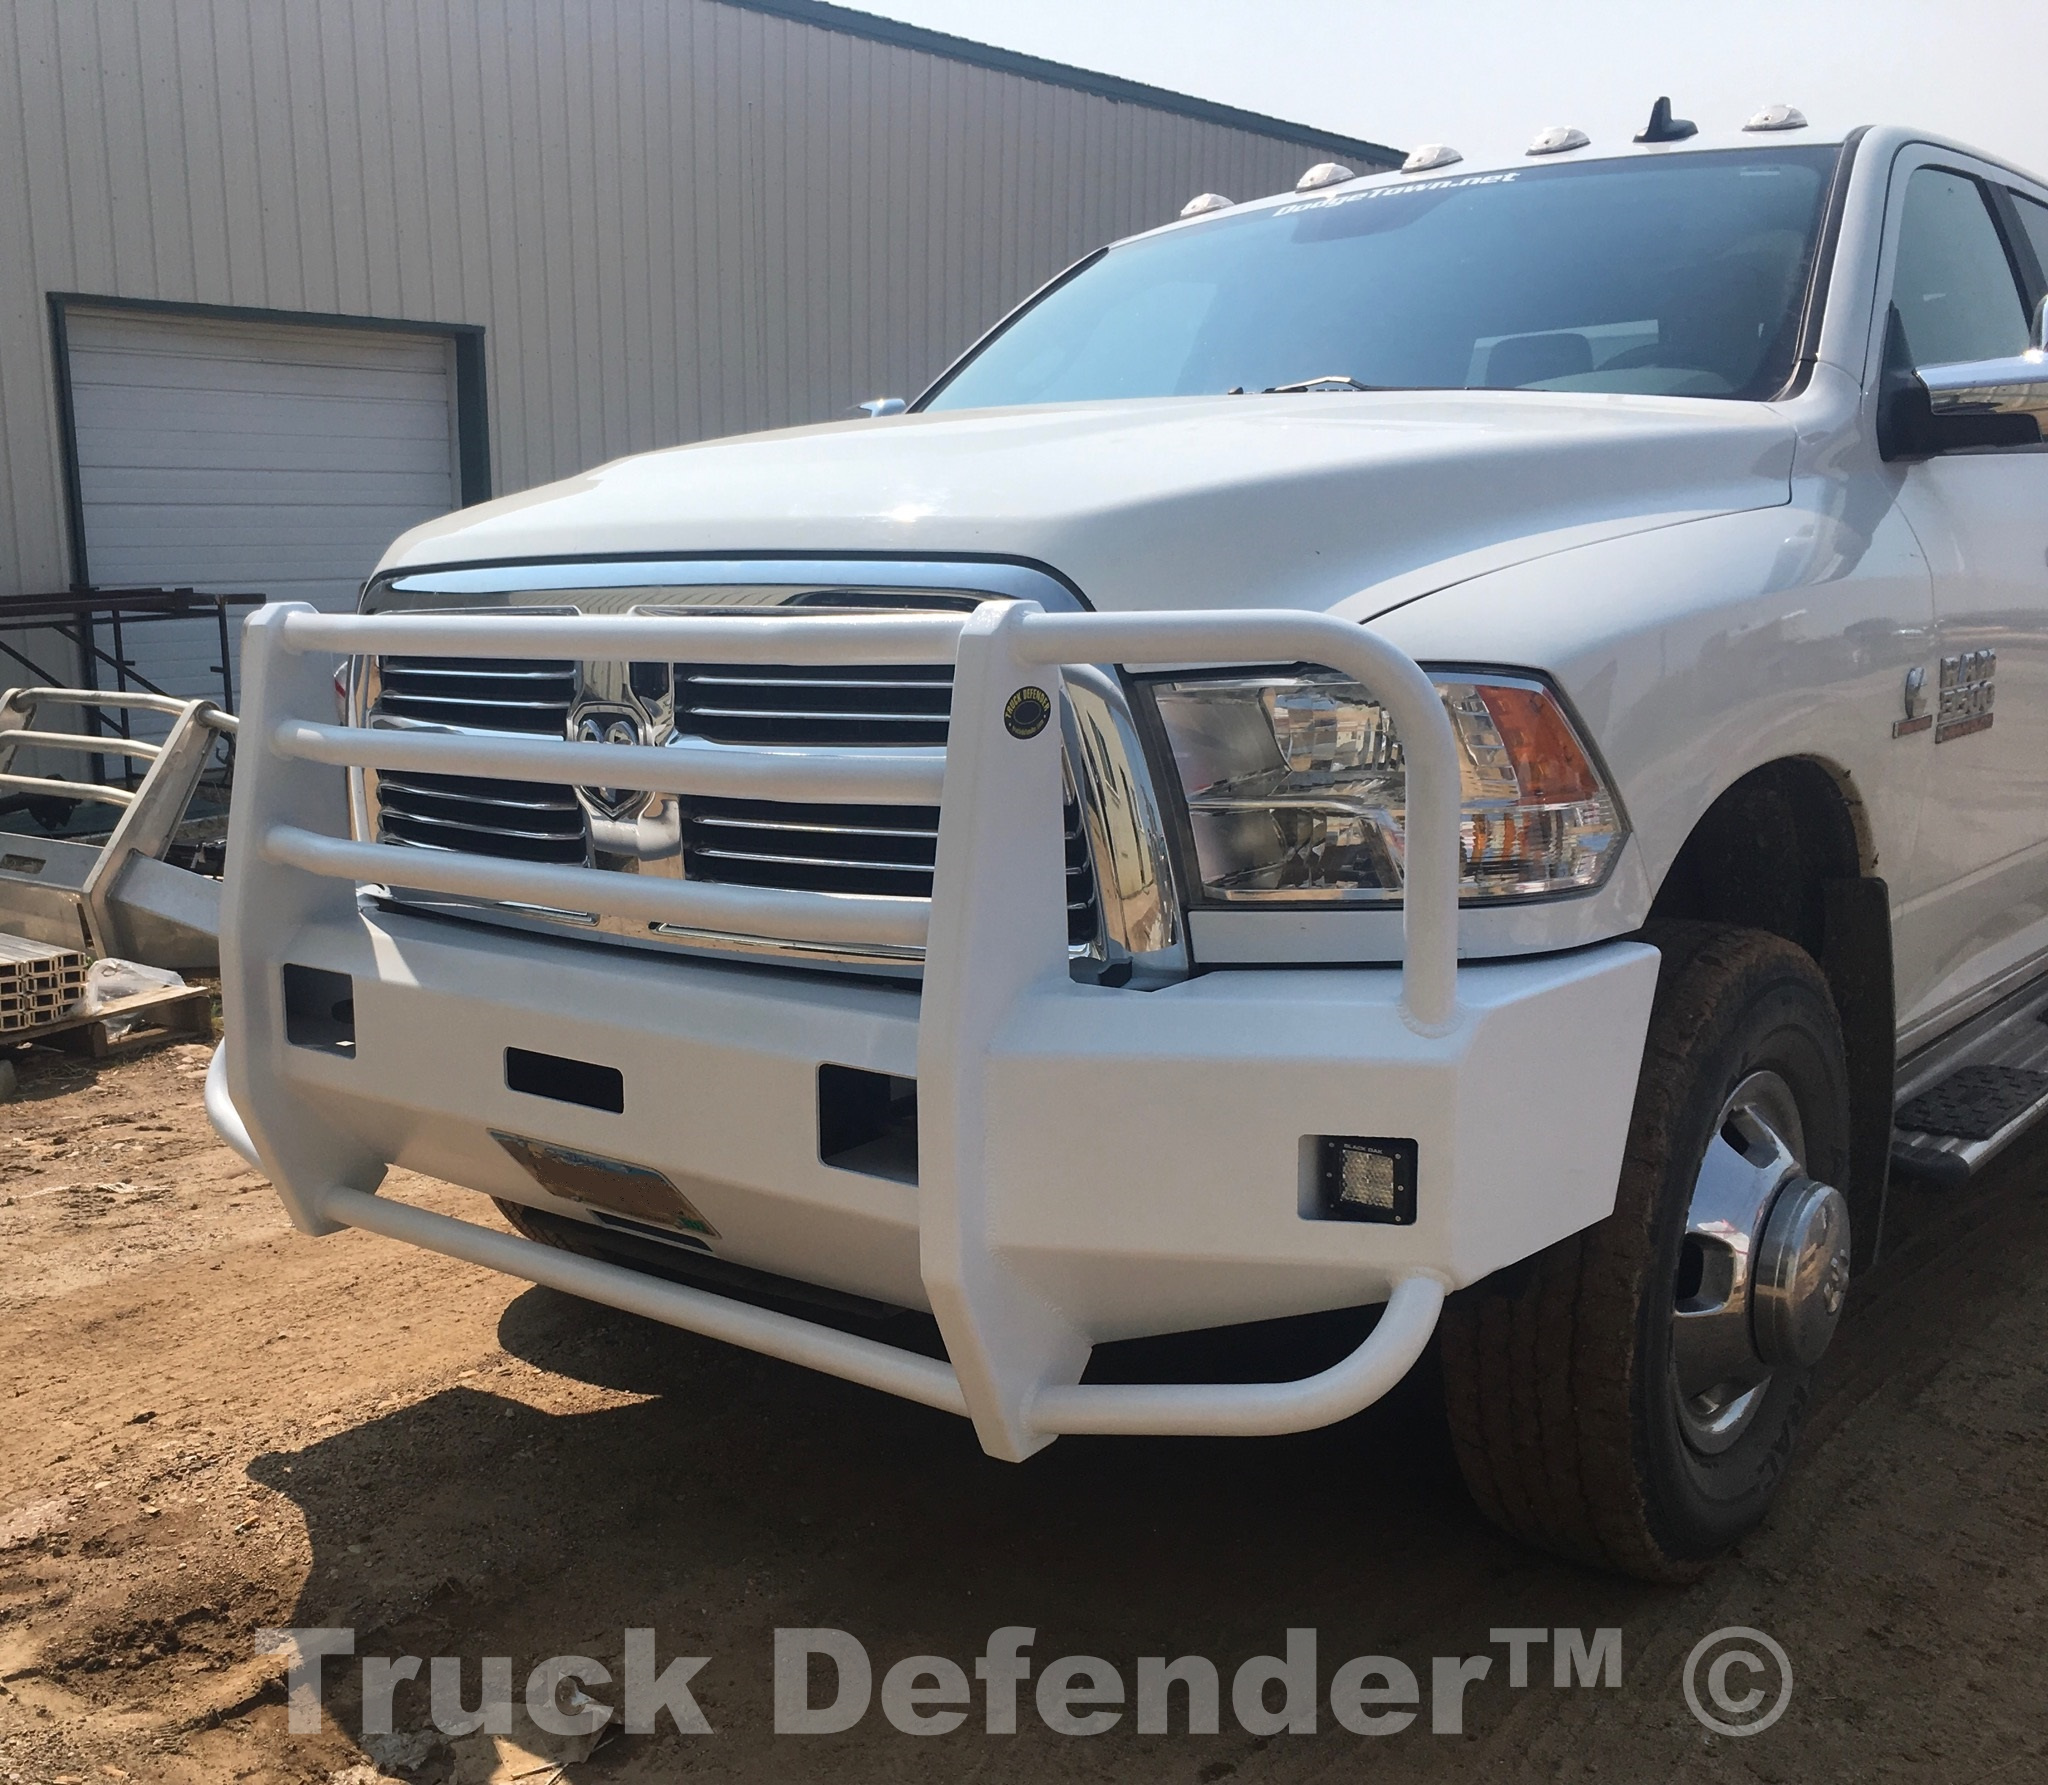 Black Oak Lights Truck Defender Vale South Dakota